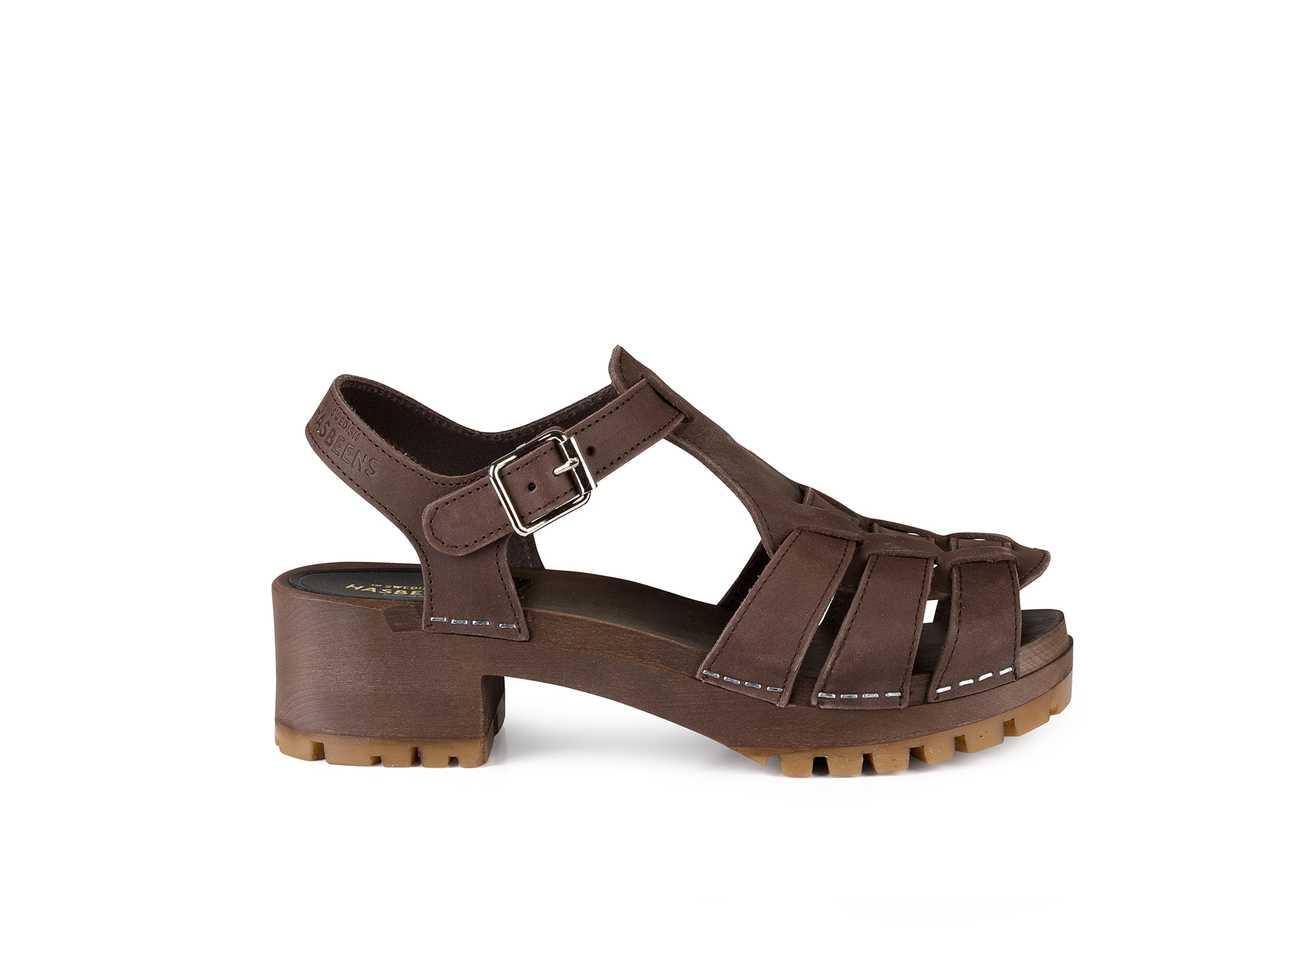 Grunge Sandal Chocolate Brown Nubuck / Chocolate Brown Sole